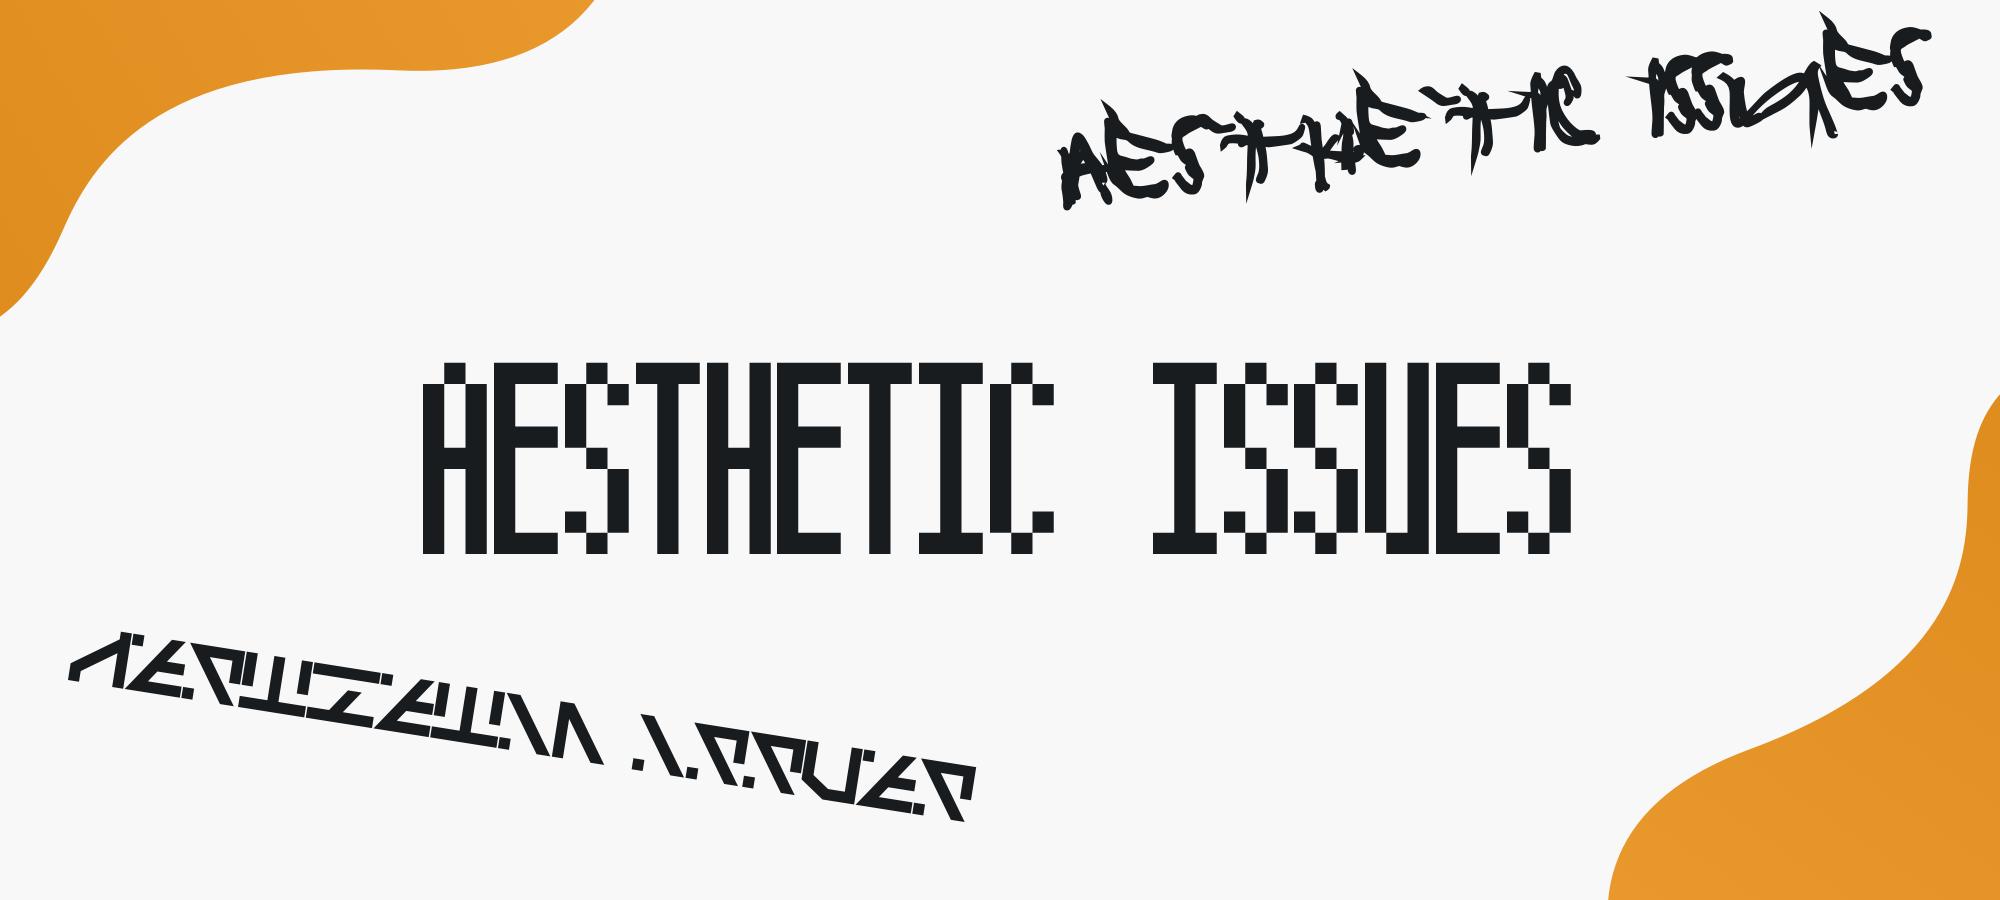 aestethic-issues